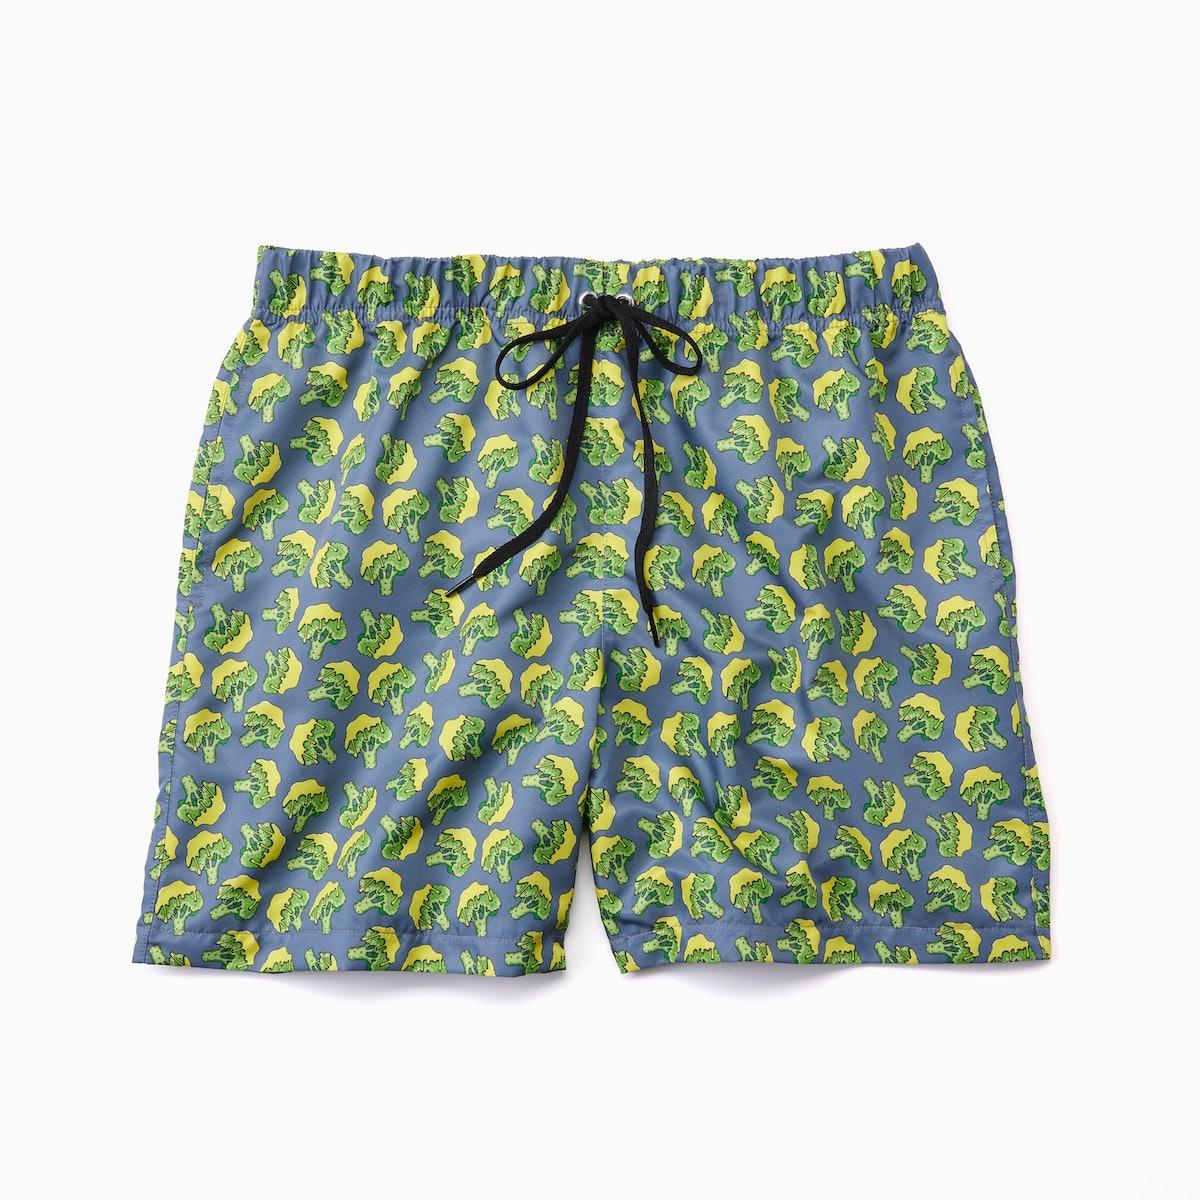 Panera's Swim Soup summer 2021 collection features swim trunks.